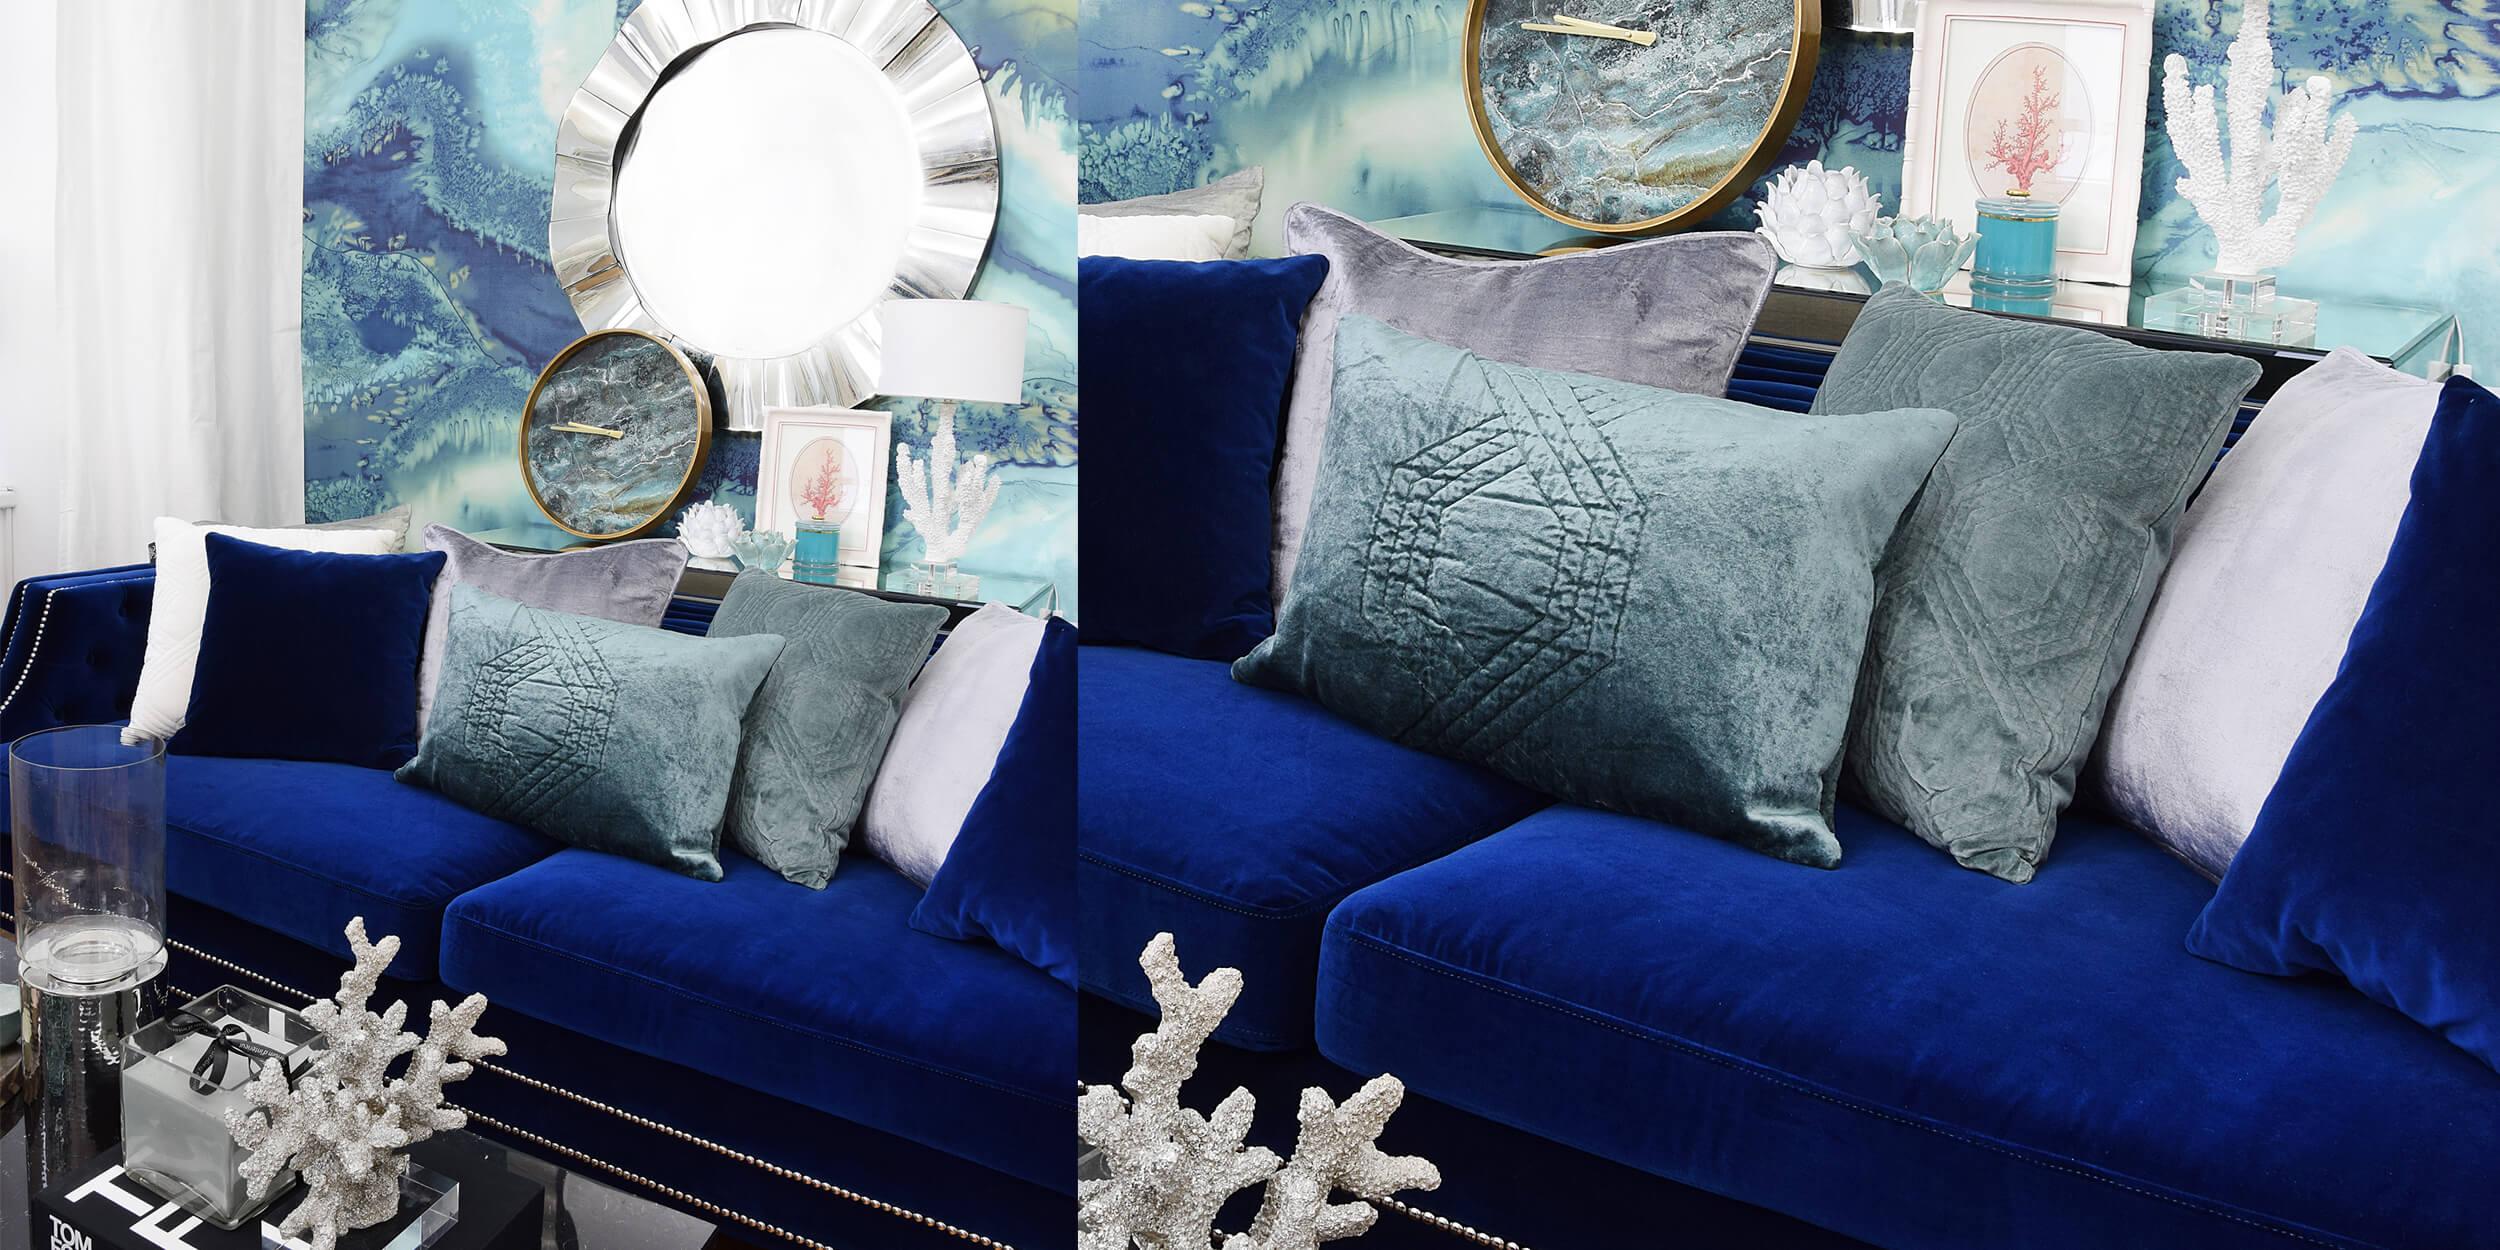 Samtsofa in königlichem Blau